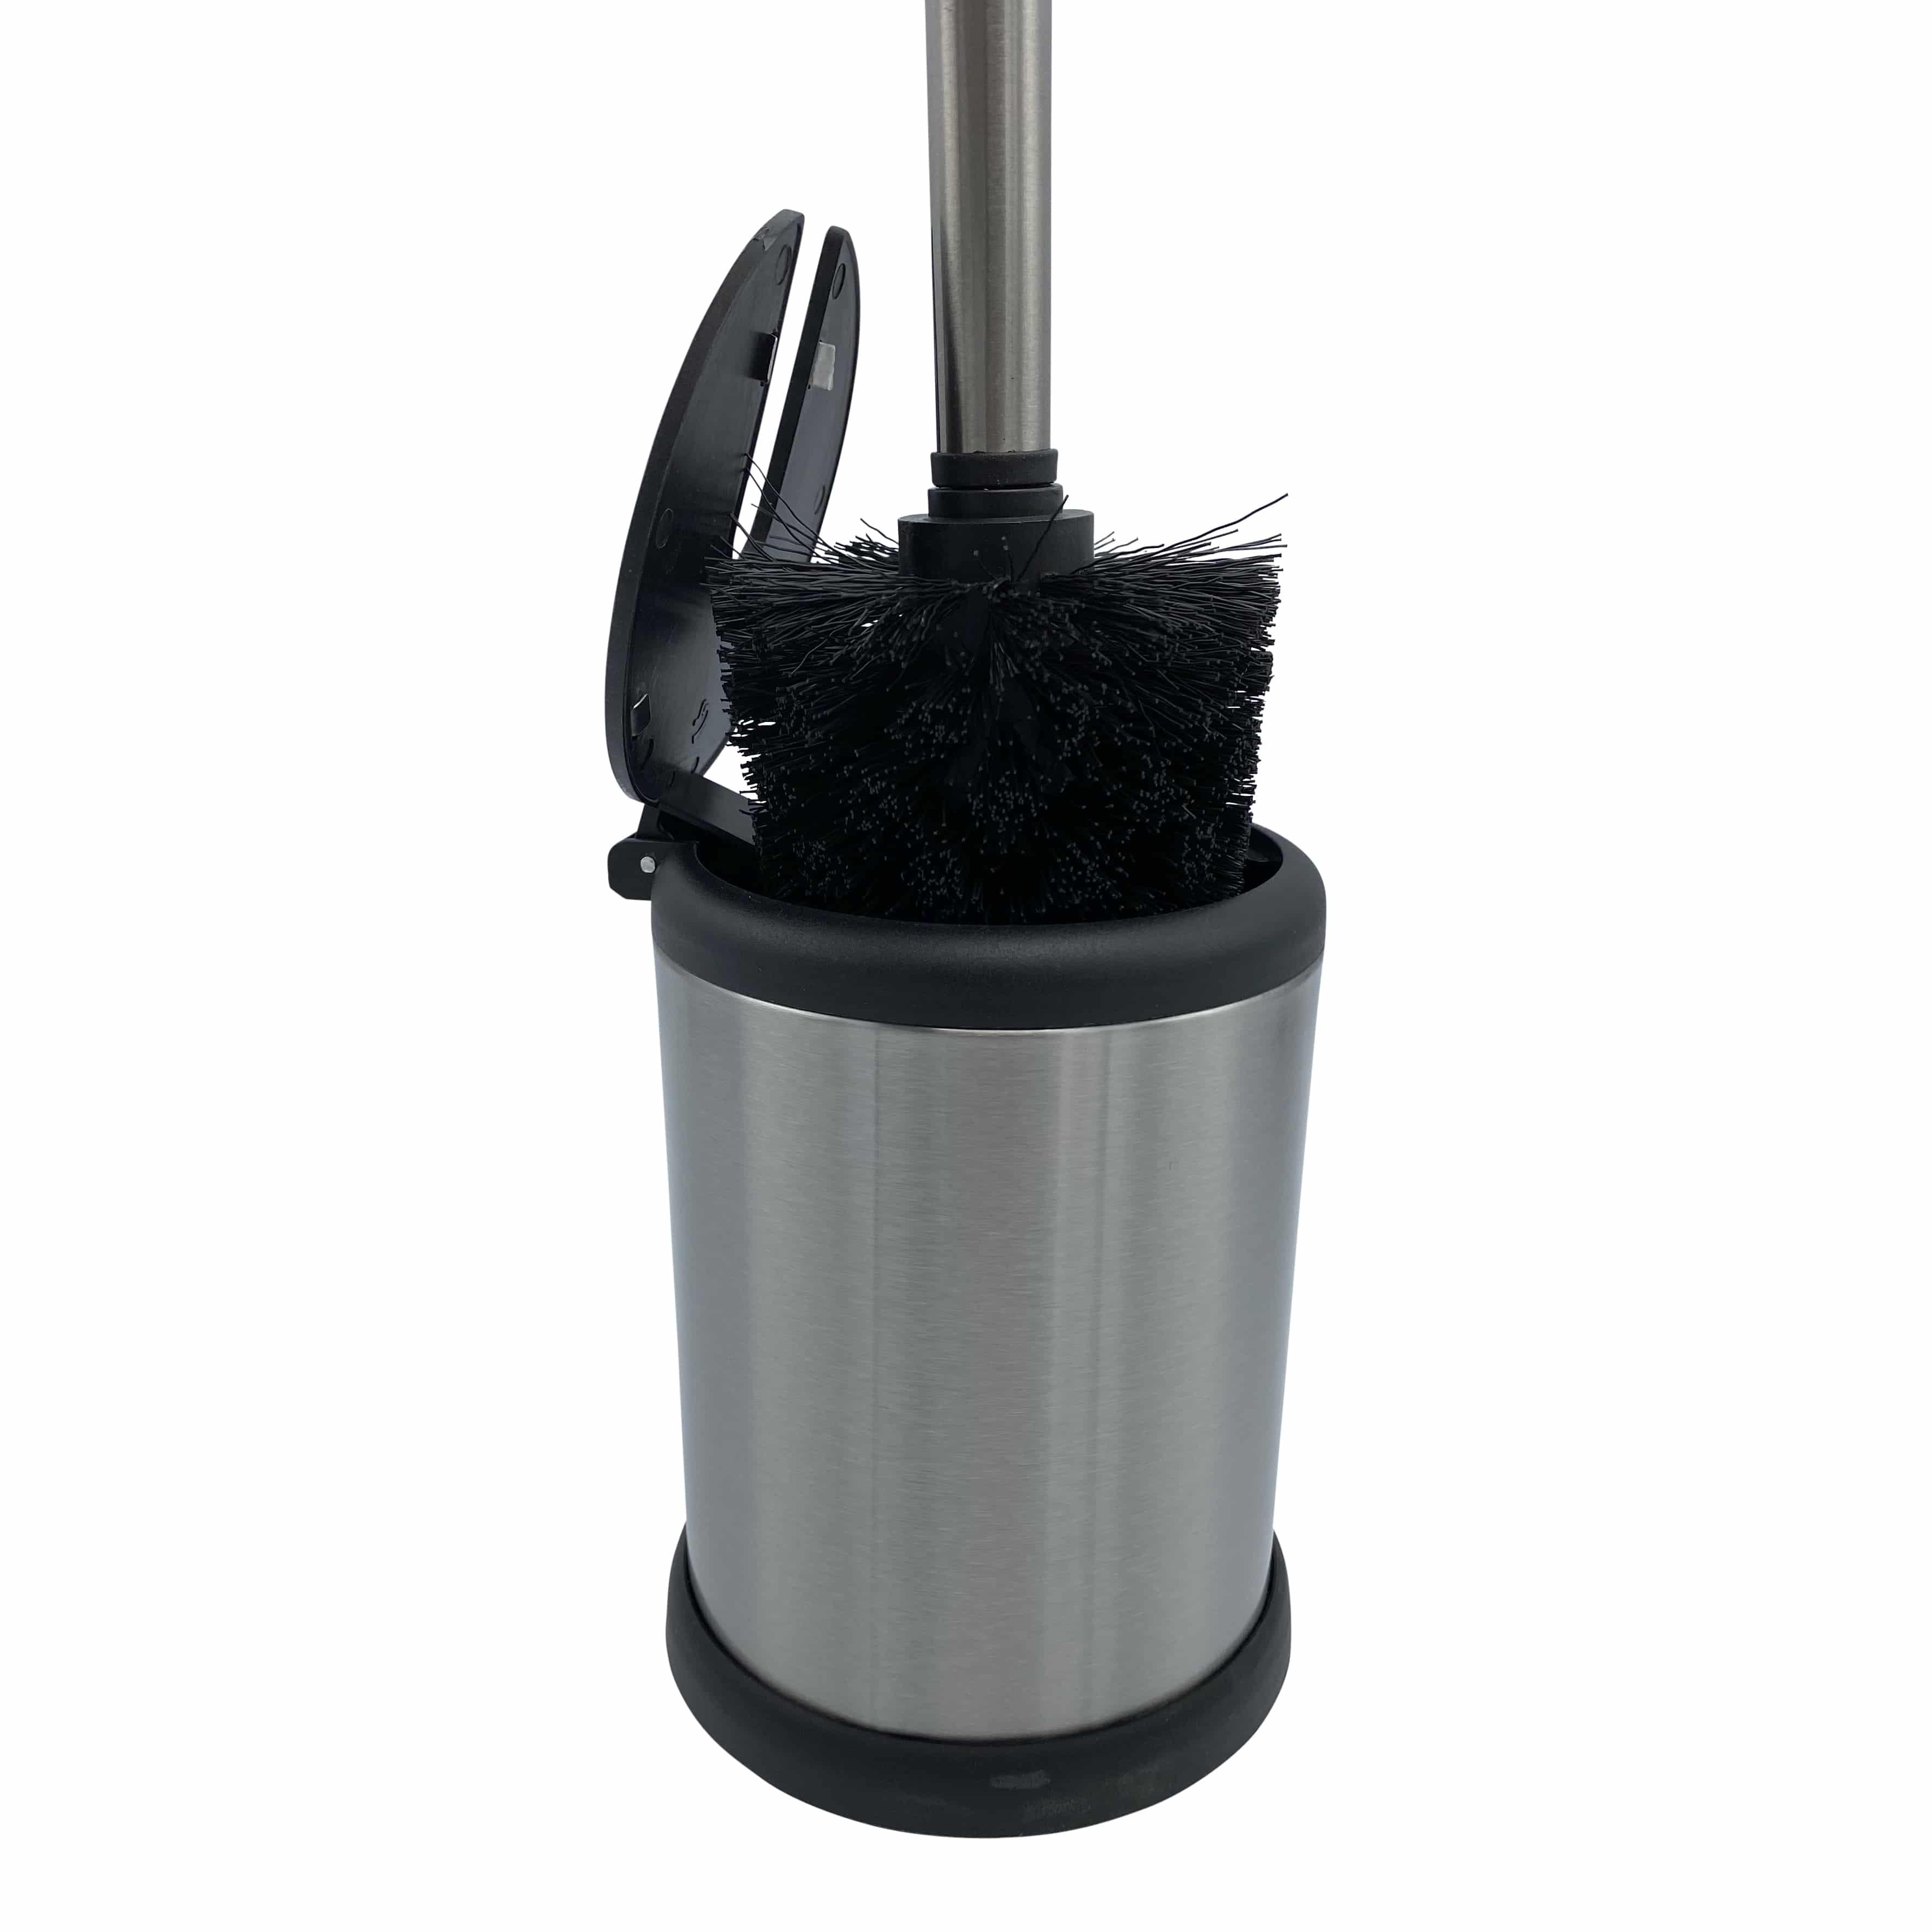 4goodz toiletborstel met klep - 11,5x39 cm - Chroom